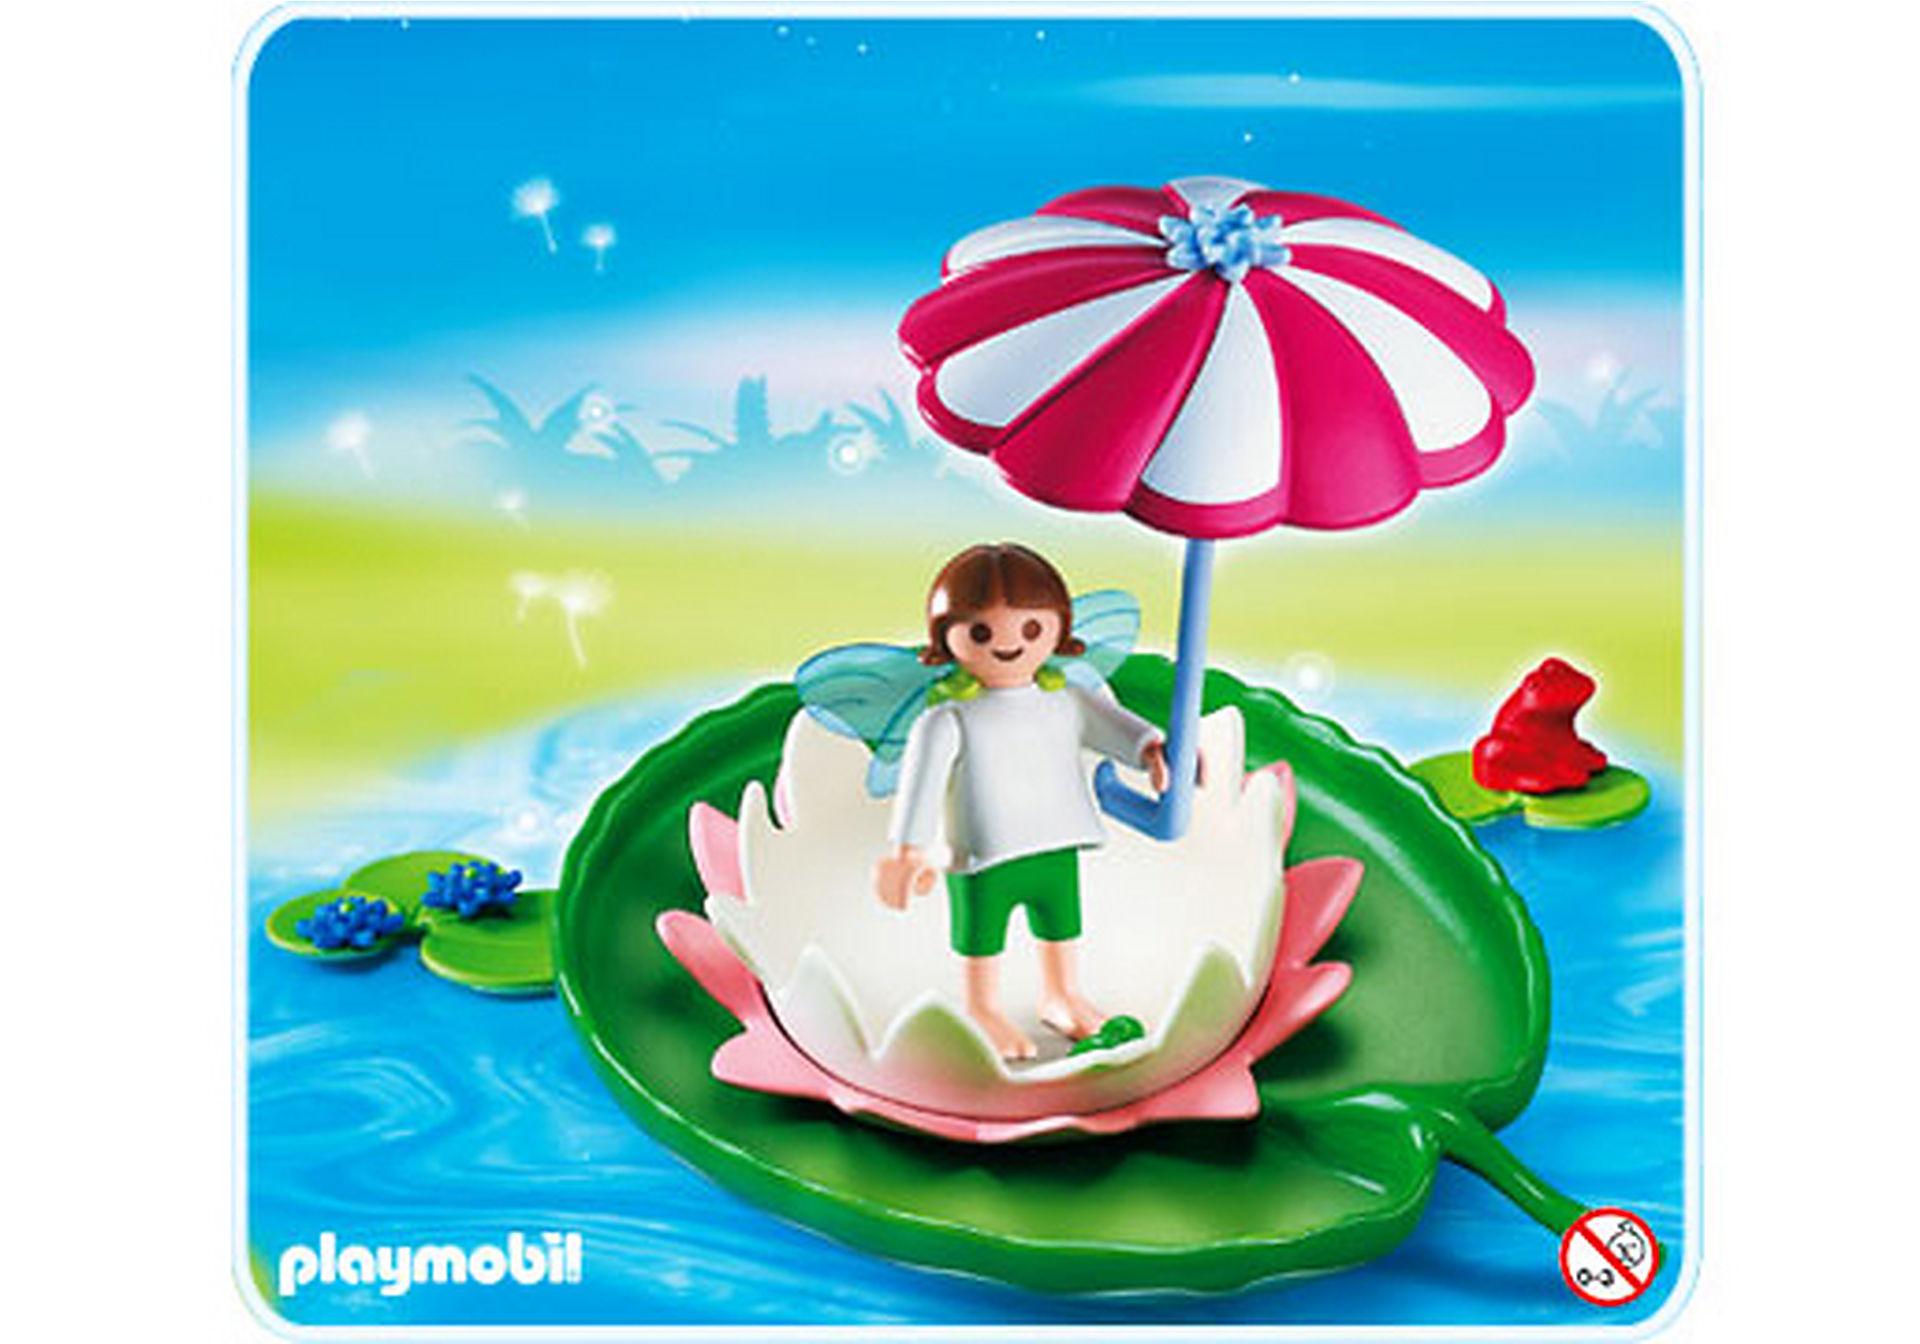 http://media.playmobil.com/i/playmobil/4198-A_product_detail/Seerosenfee